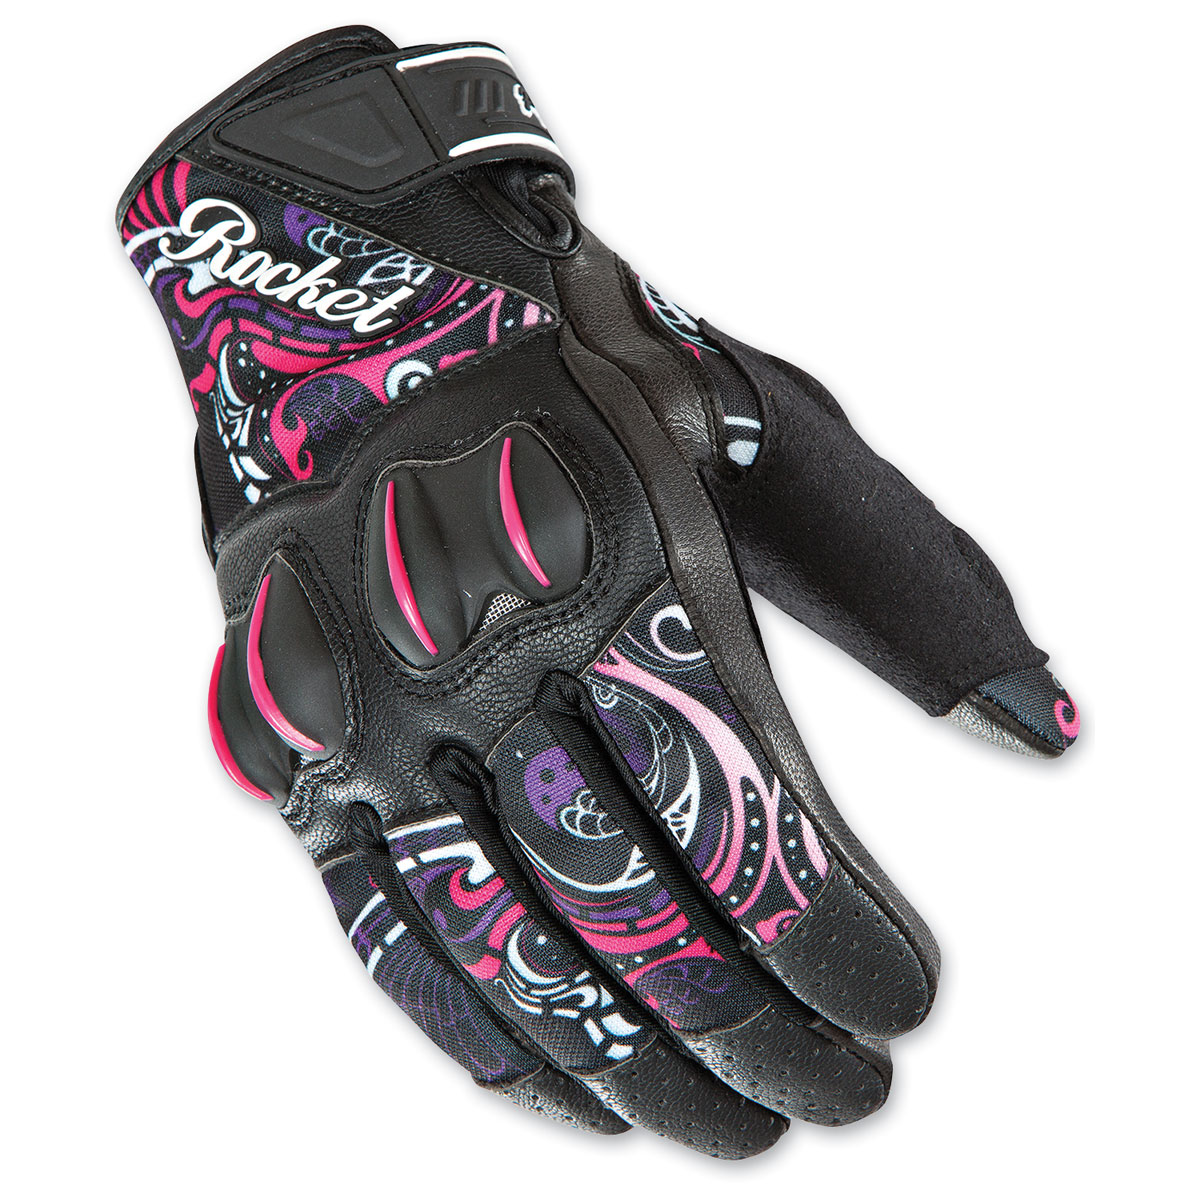 Joe Rocket Women's Cyntek Eye Candy Gloves